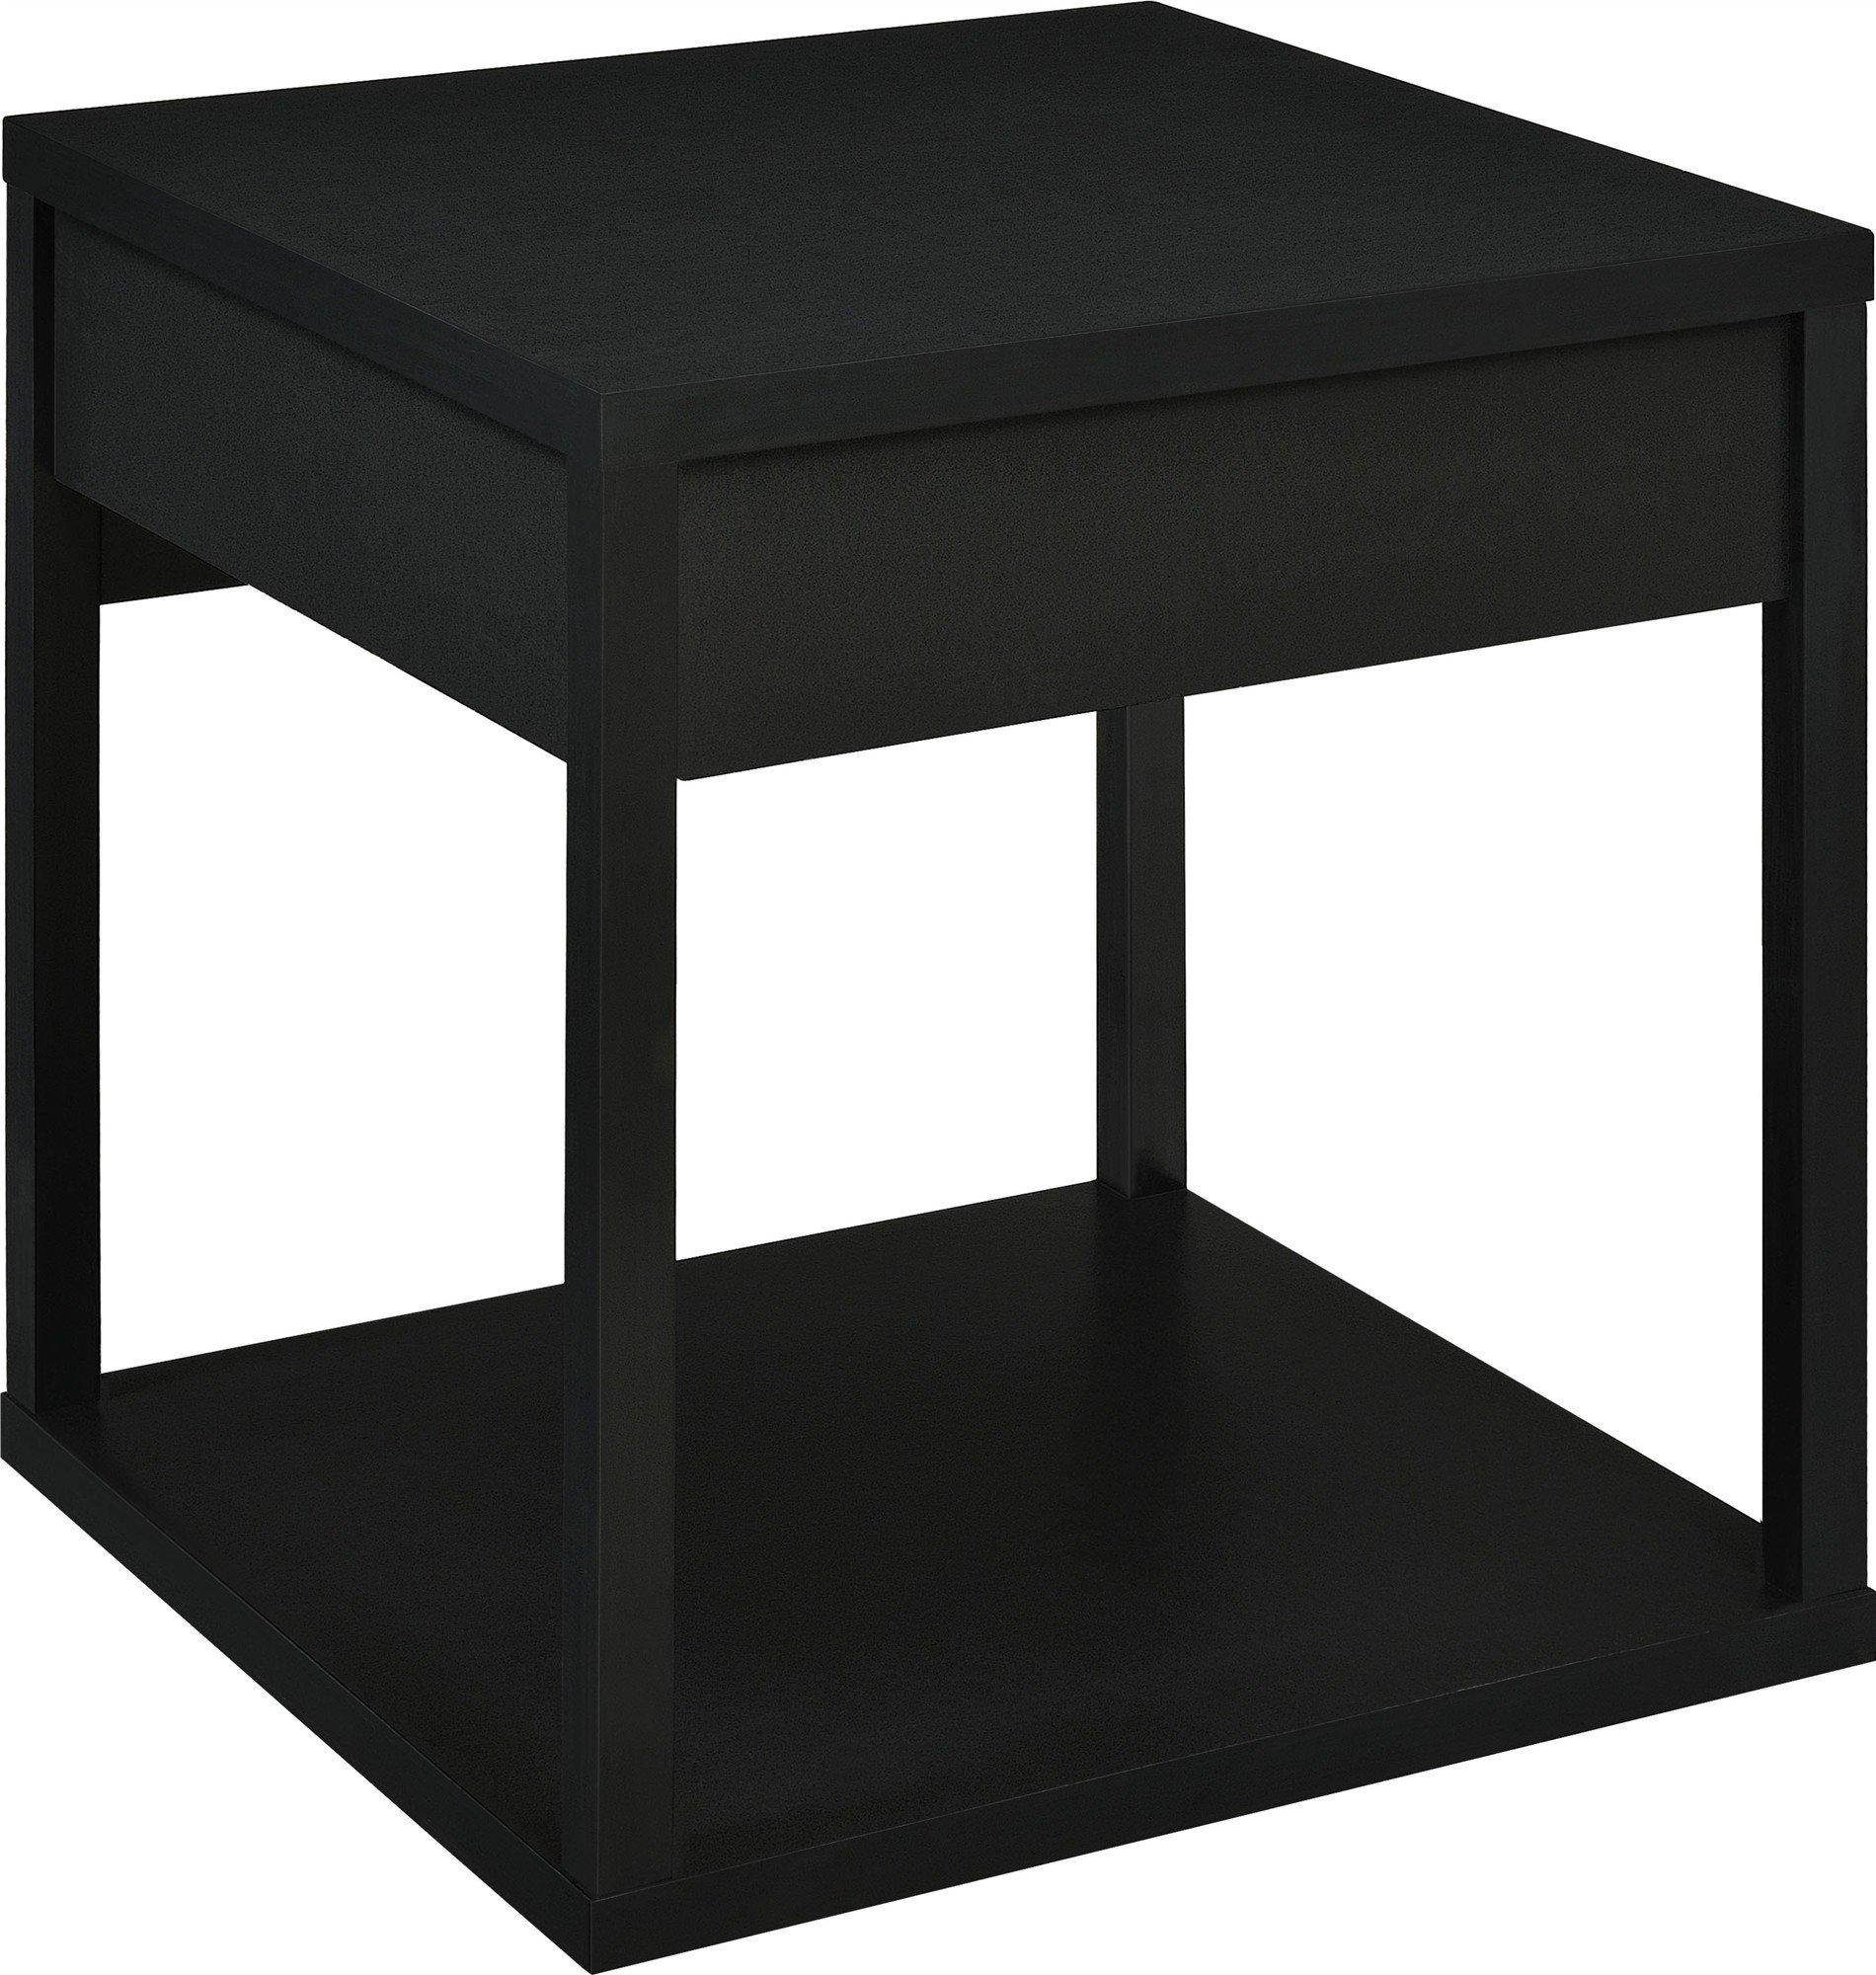 Altra End Table With Drawer Black Furniturendecor Com